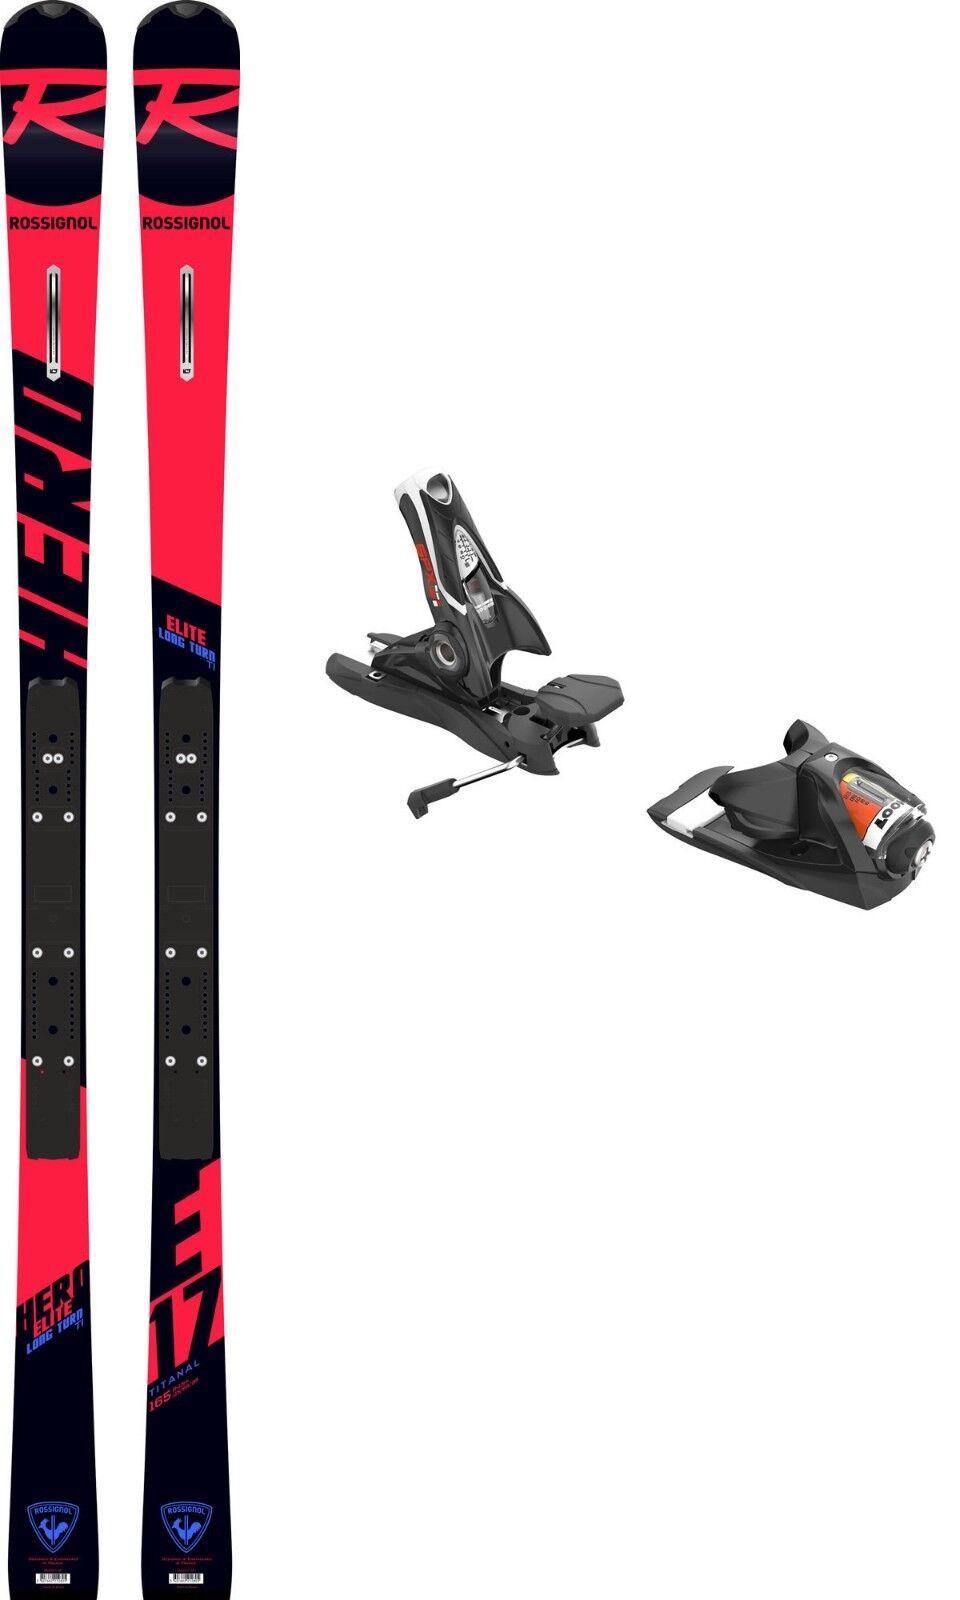 Skiing Ski ROSSIGNOL HERO ELITE LT Ti ( R22 ) + SPX 12 Race season 2018 19